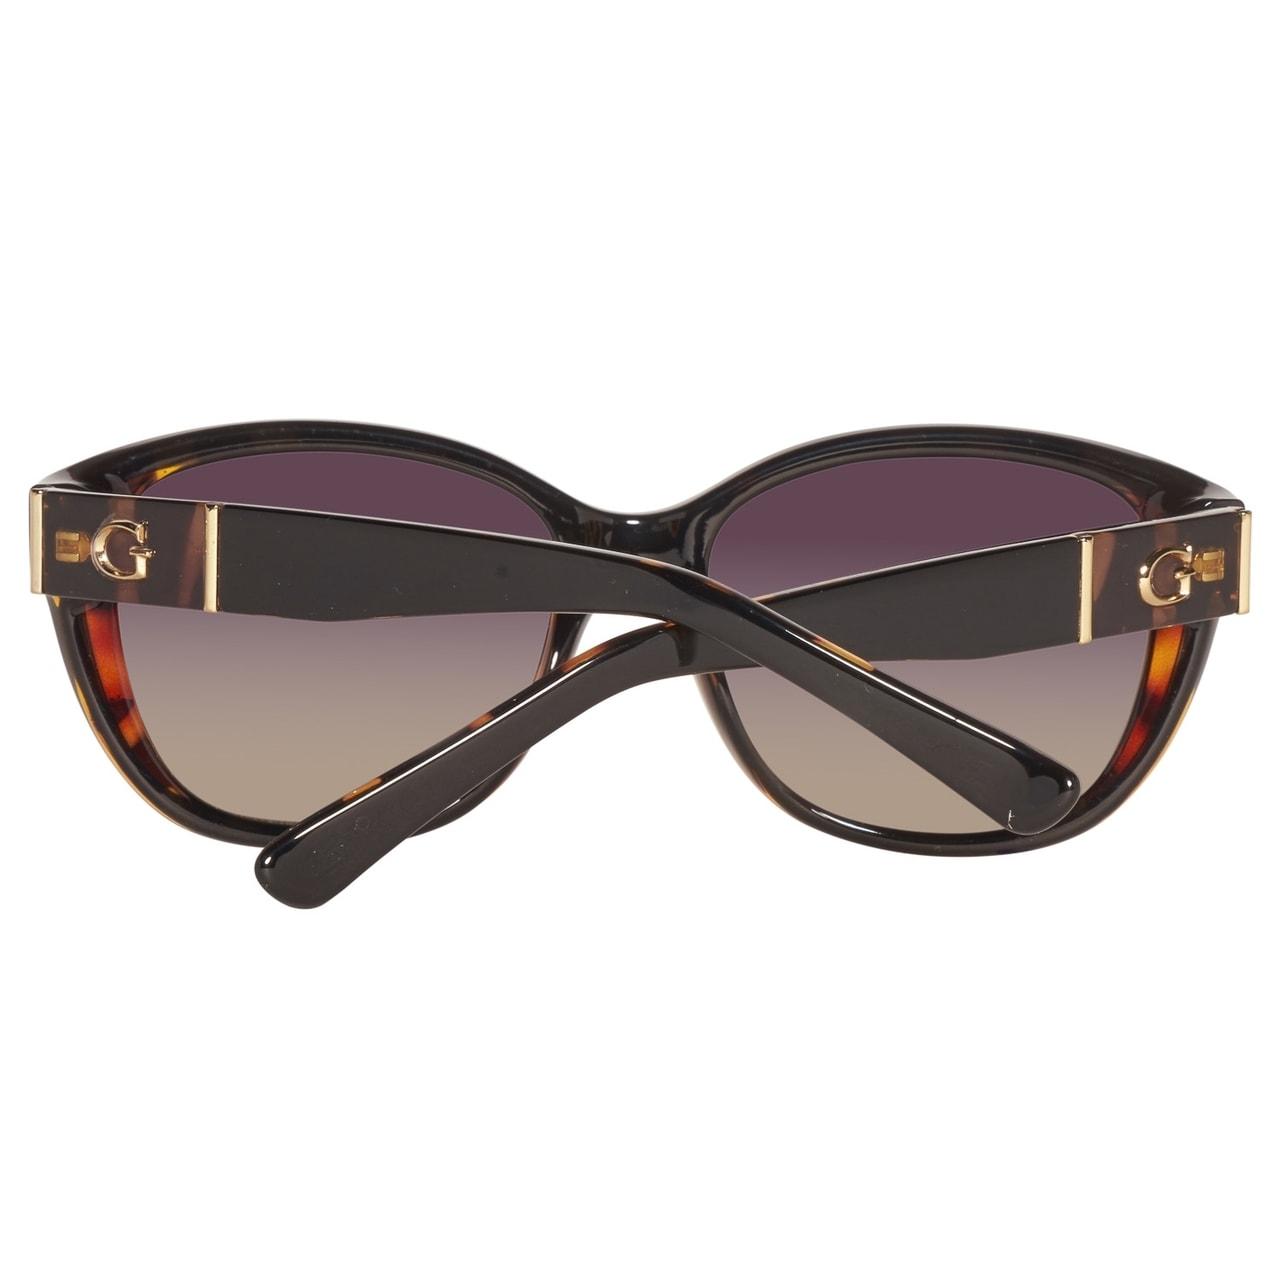 Glamadise.hu Fashion paradise - Női napszemüveg Guess - Barna ... 4ecde998aa